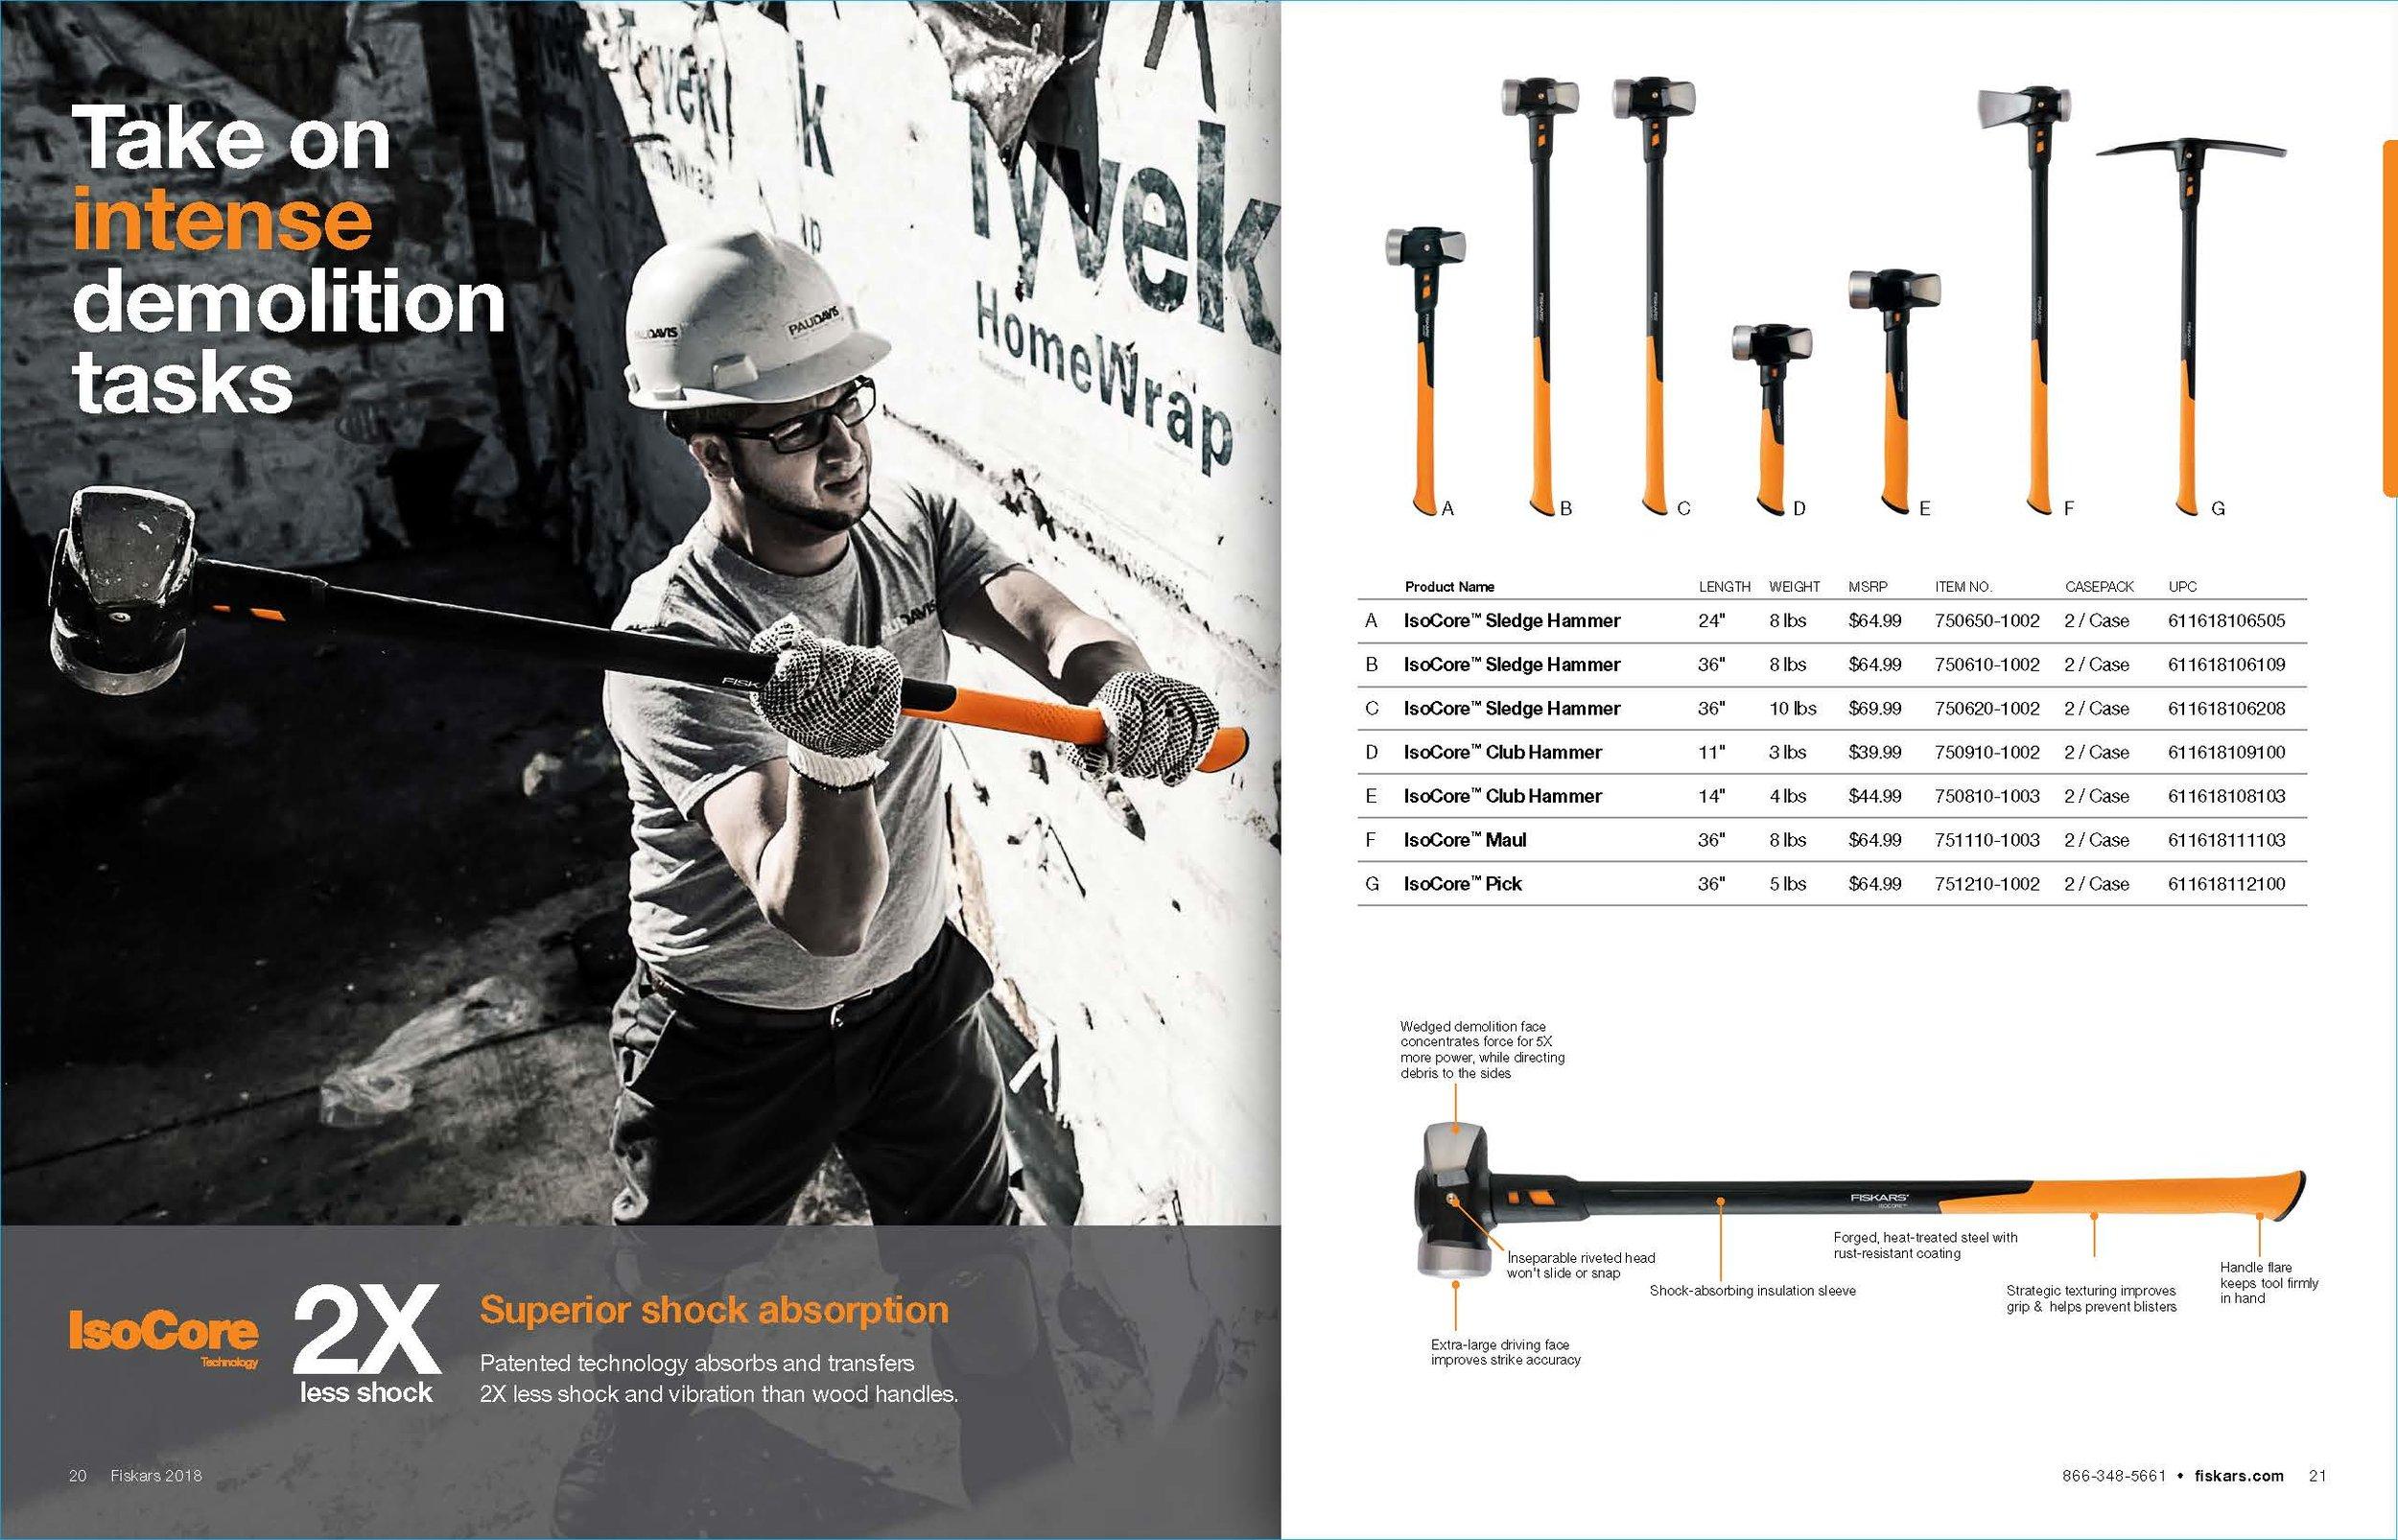 186_Catalog_Industrial 2018_V8SPREADS_Page_11.jpg